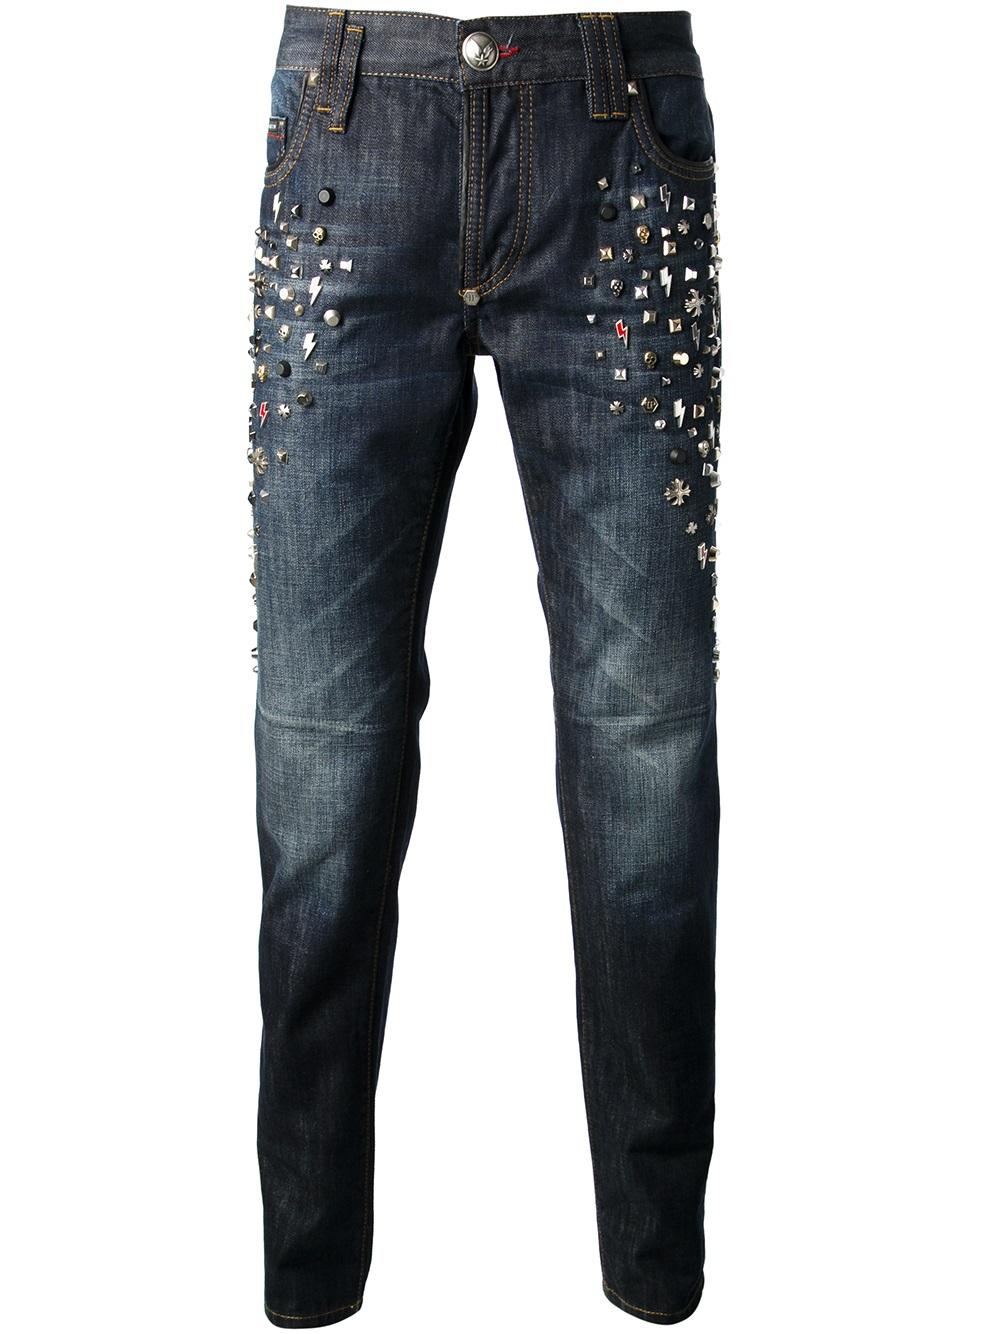 philipp plein studded jeans in blue for men lyst. Black Bedroom Furniture Sets. Home Design Ideas